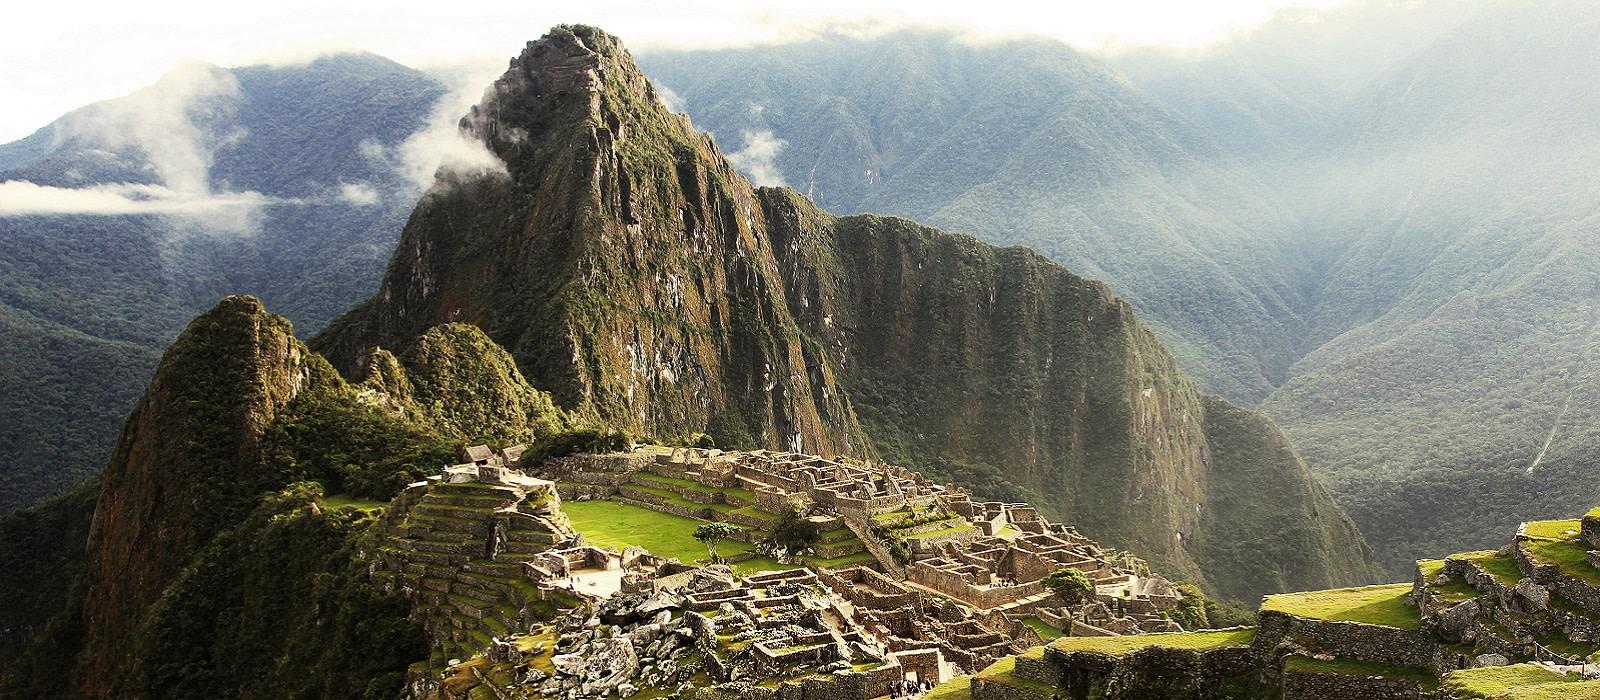 Reiseziele Südamerika - Machu Picchu